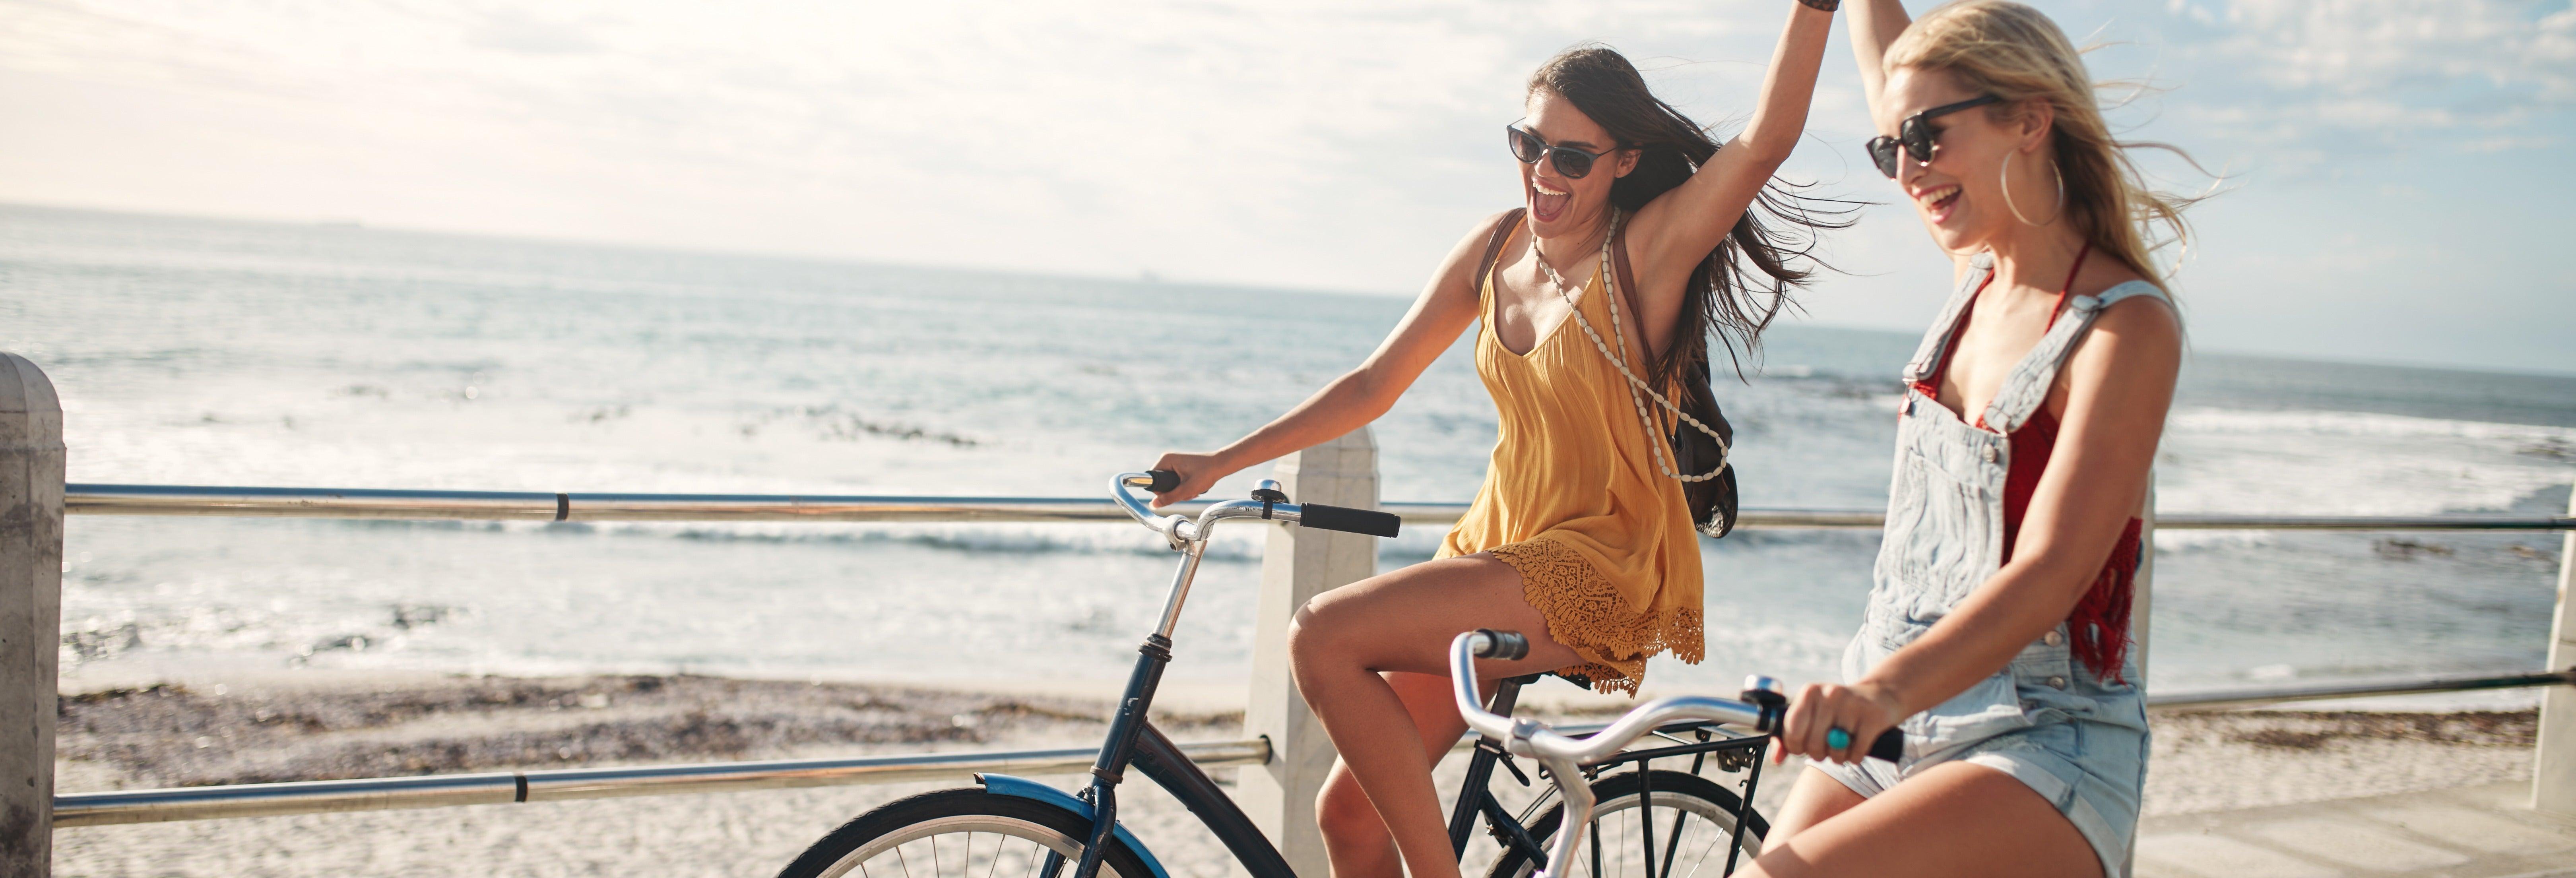 Tour di Torremolinos in bicicletta elettrica